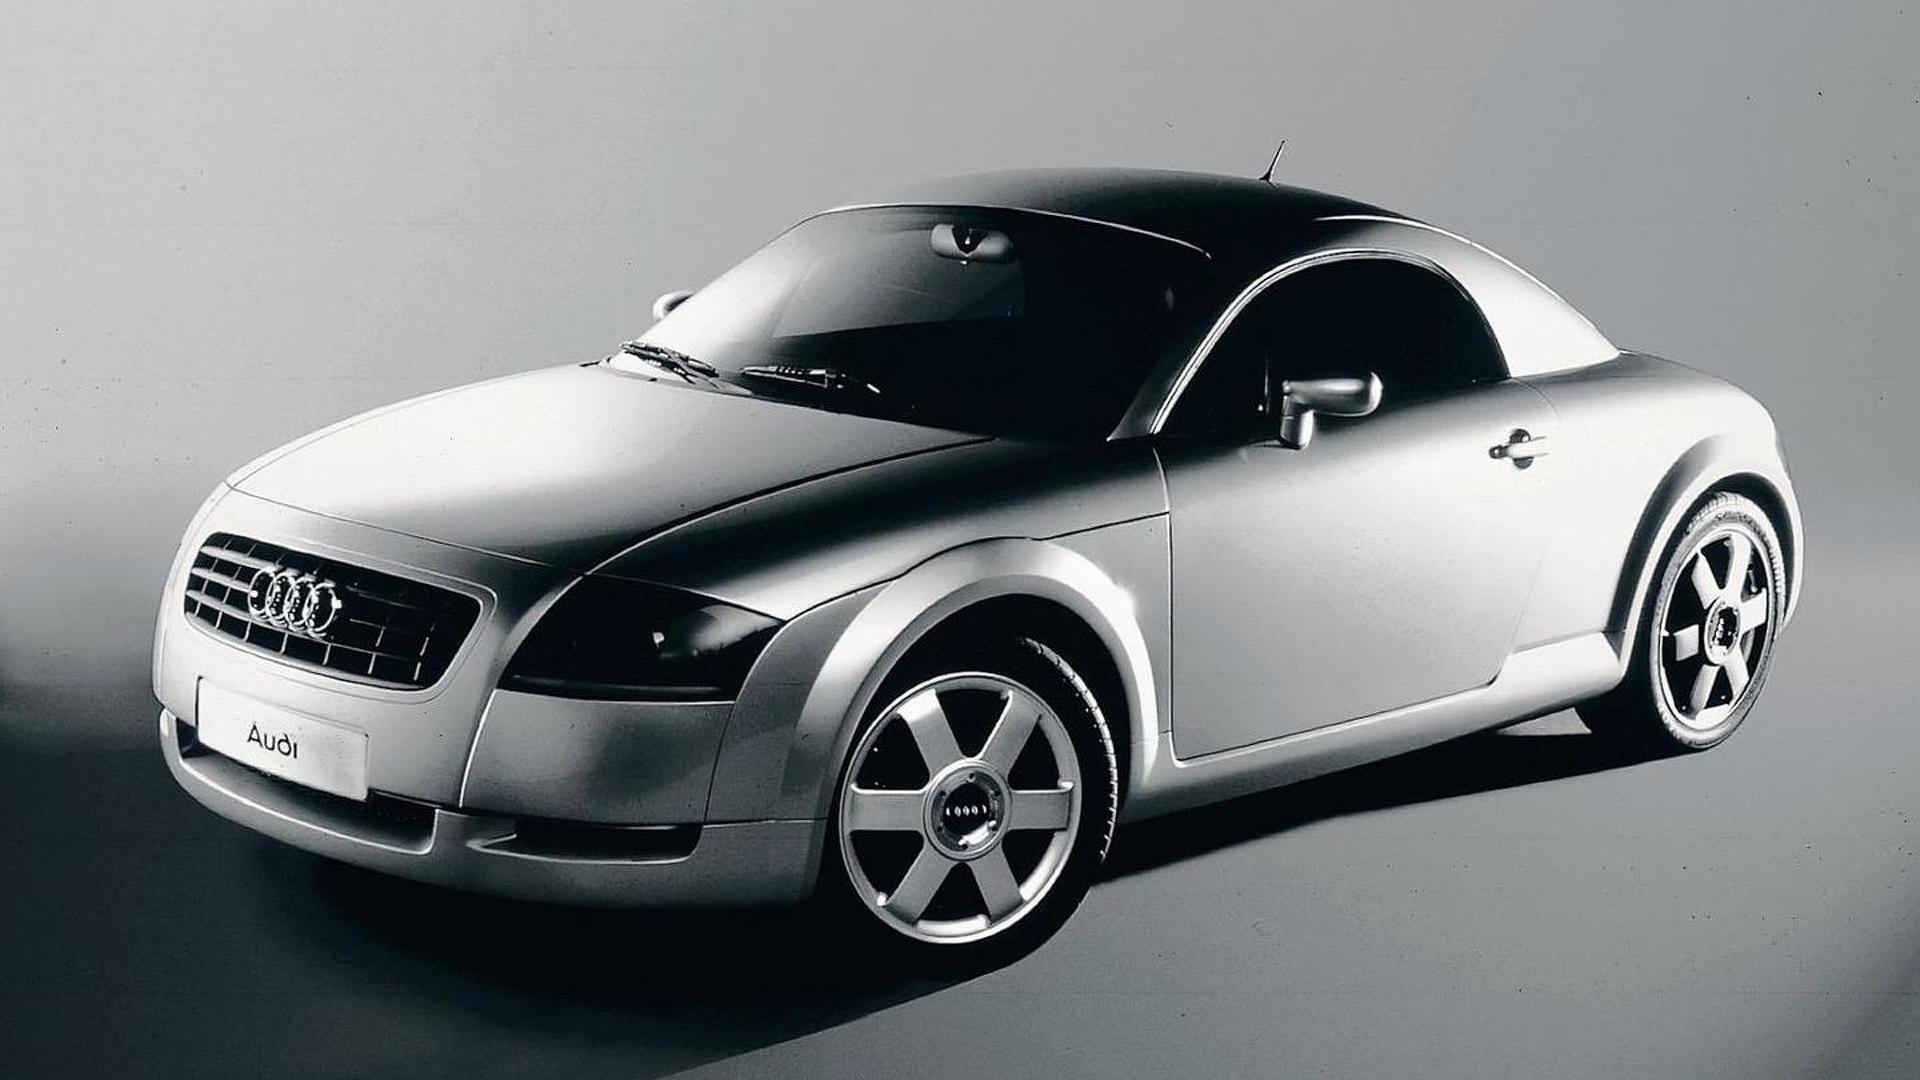 Audi museum goes State of the ArTT, celebrates the TT